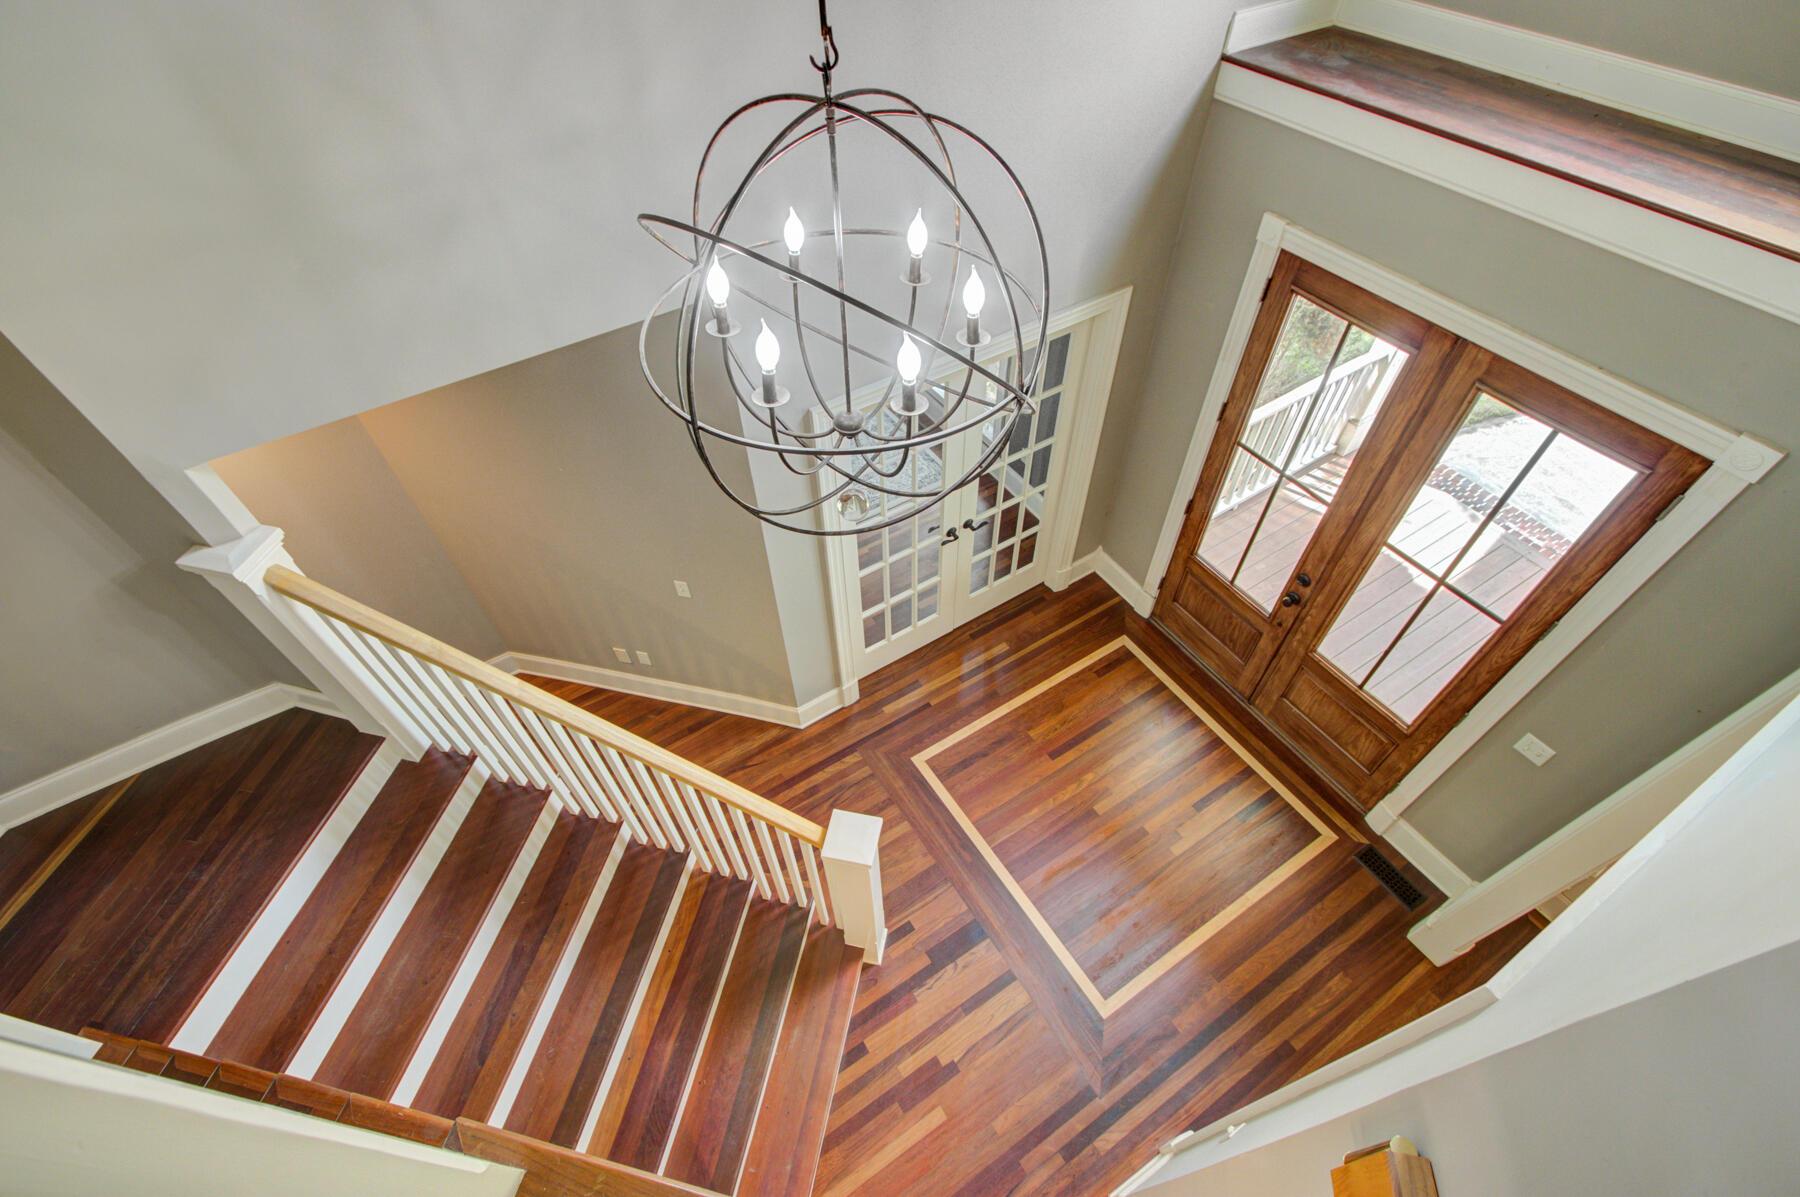 Dunes West Homes For Sale - 3095 Pignatelli, Mount Pleasant, SC - 40